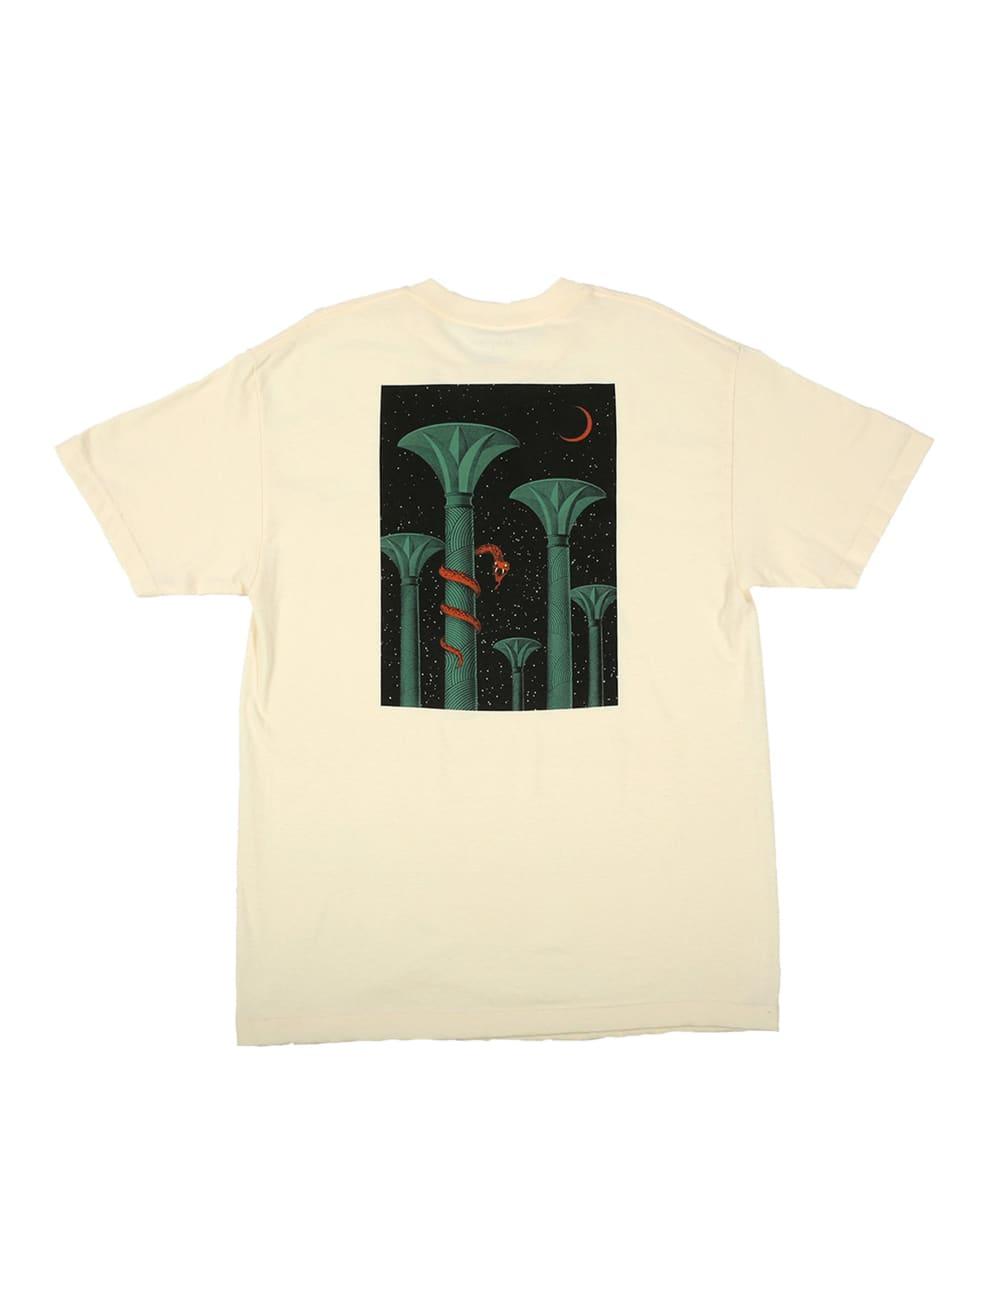 "PICTURE SHOW-""SERPANT T-SHIRT""(CREAM)   T-Shirt by Picture Show Studios 1"